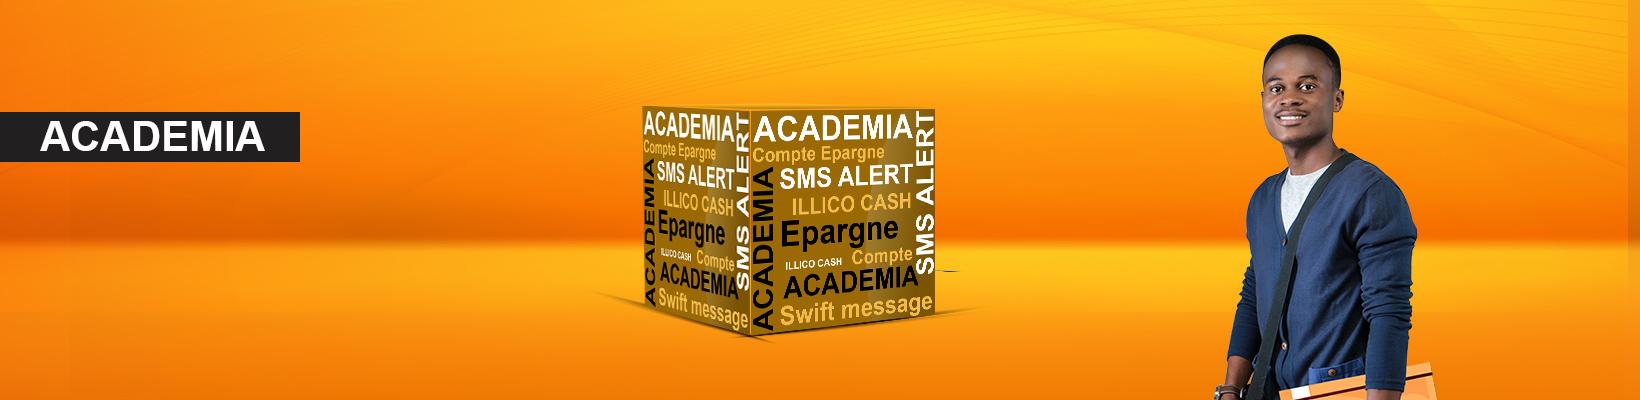 1640x400-pack-academia